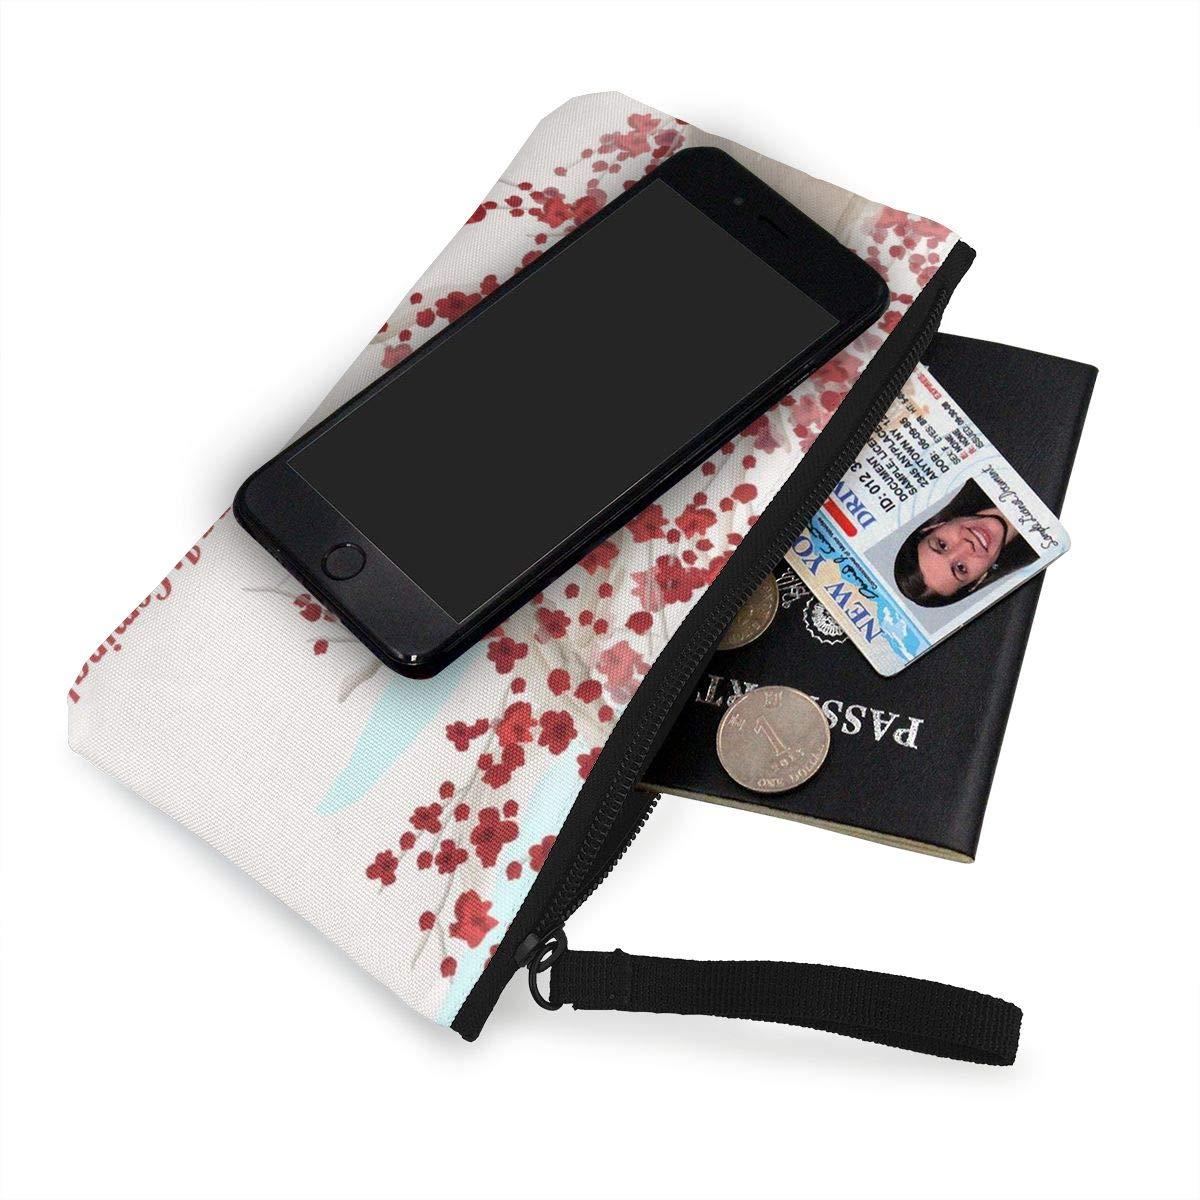 Sakura Spring Is Coming Zipper Canvas Coin Purse Wallet Make Up Bag,Cellphone Bag With Handle